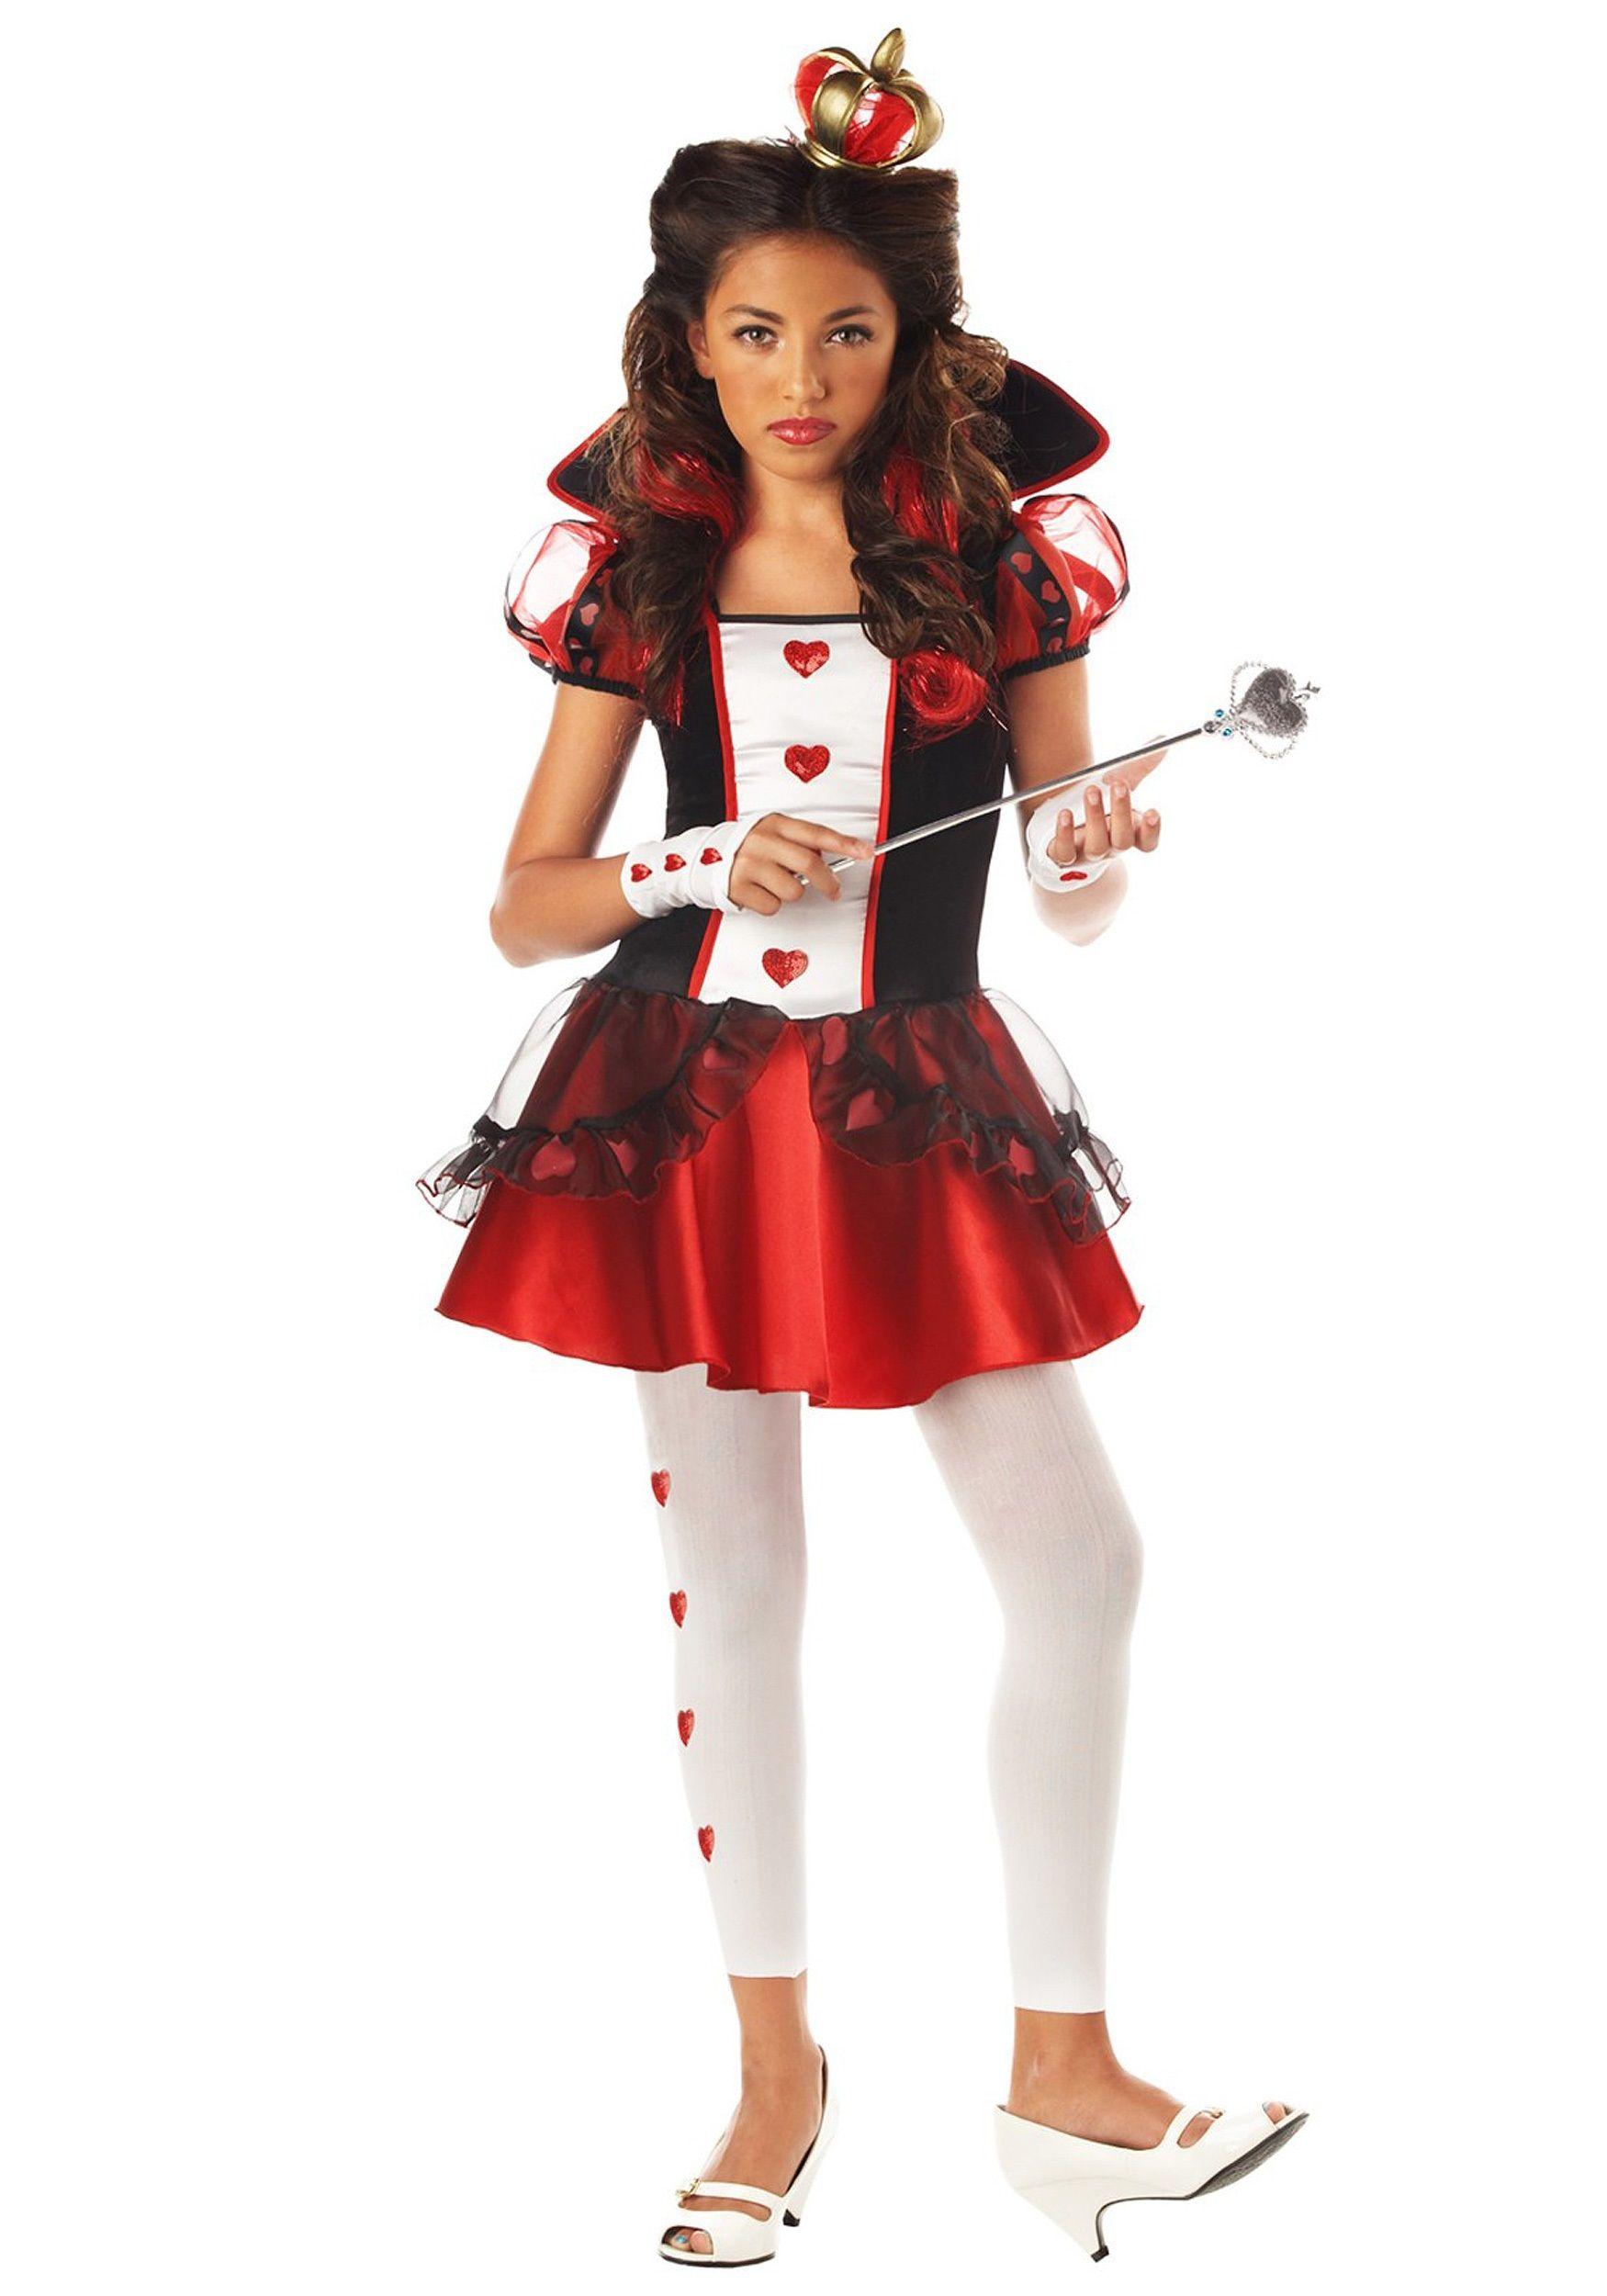 Pin by Isabelle Ryan on Halloween costumes ideas | Pinterest ...